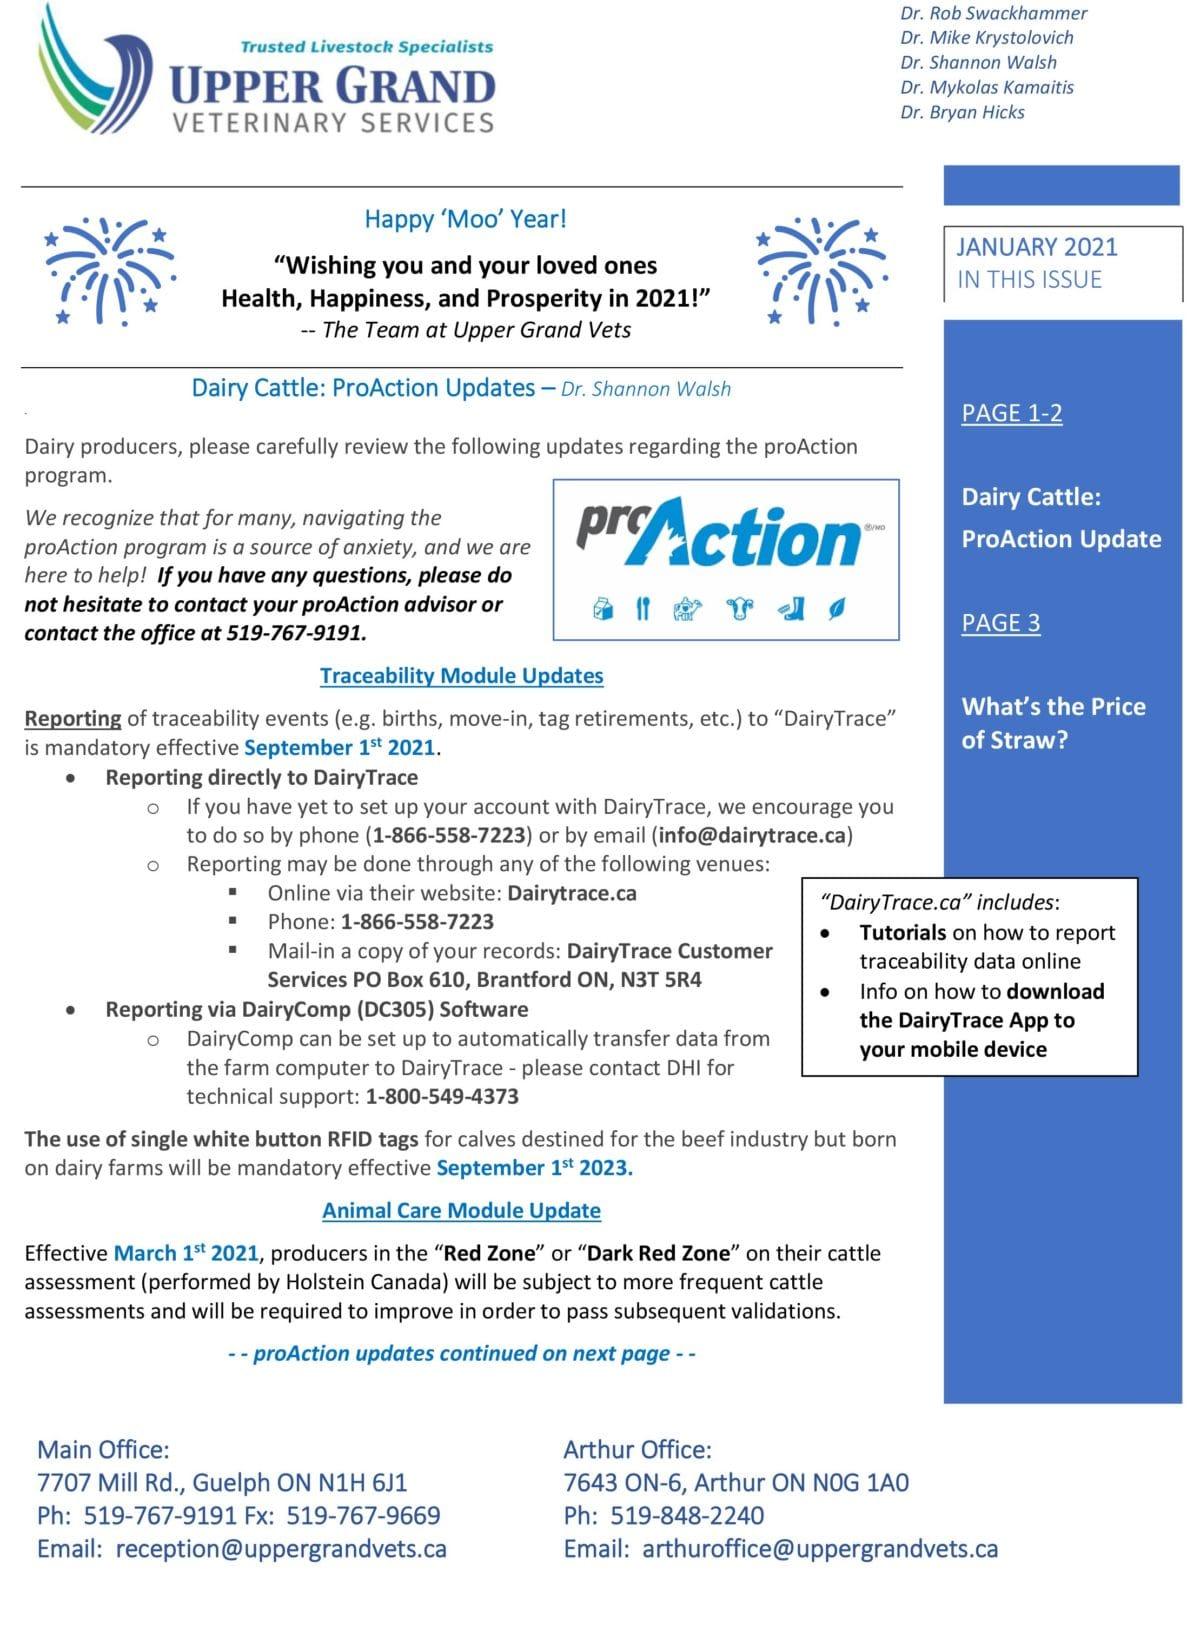 UGVS_01-2021_Newsletter-1-copy-1200x1631.jpg